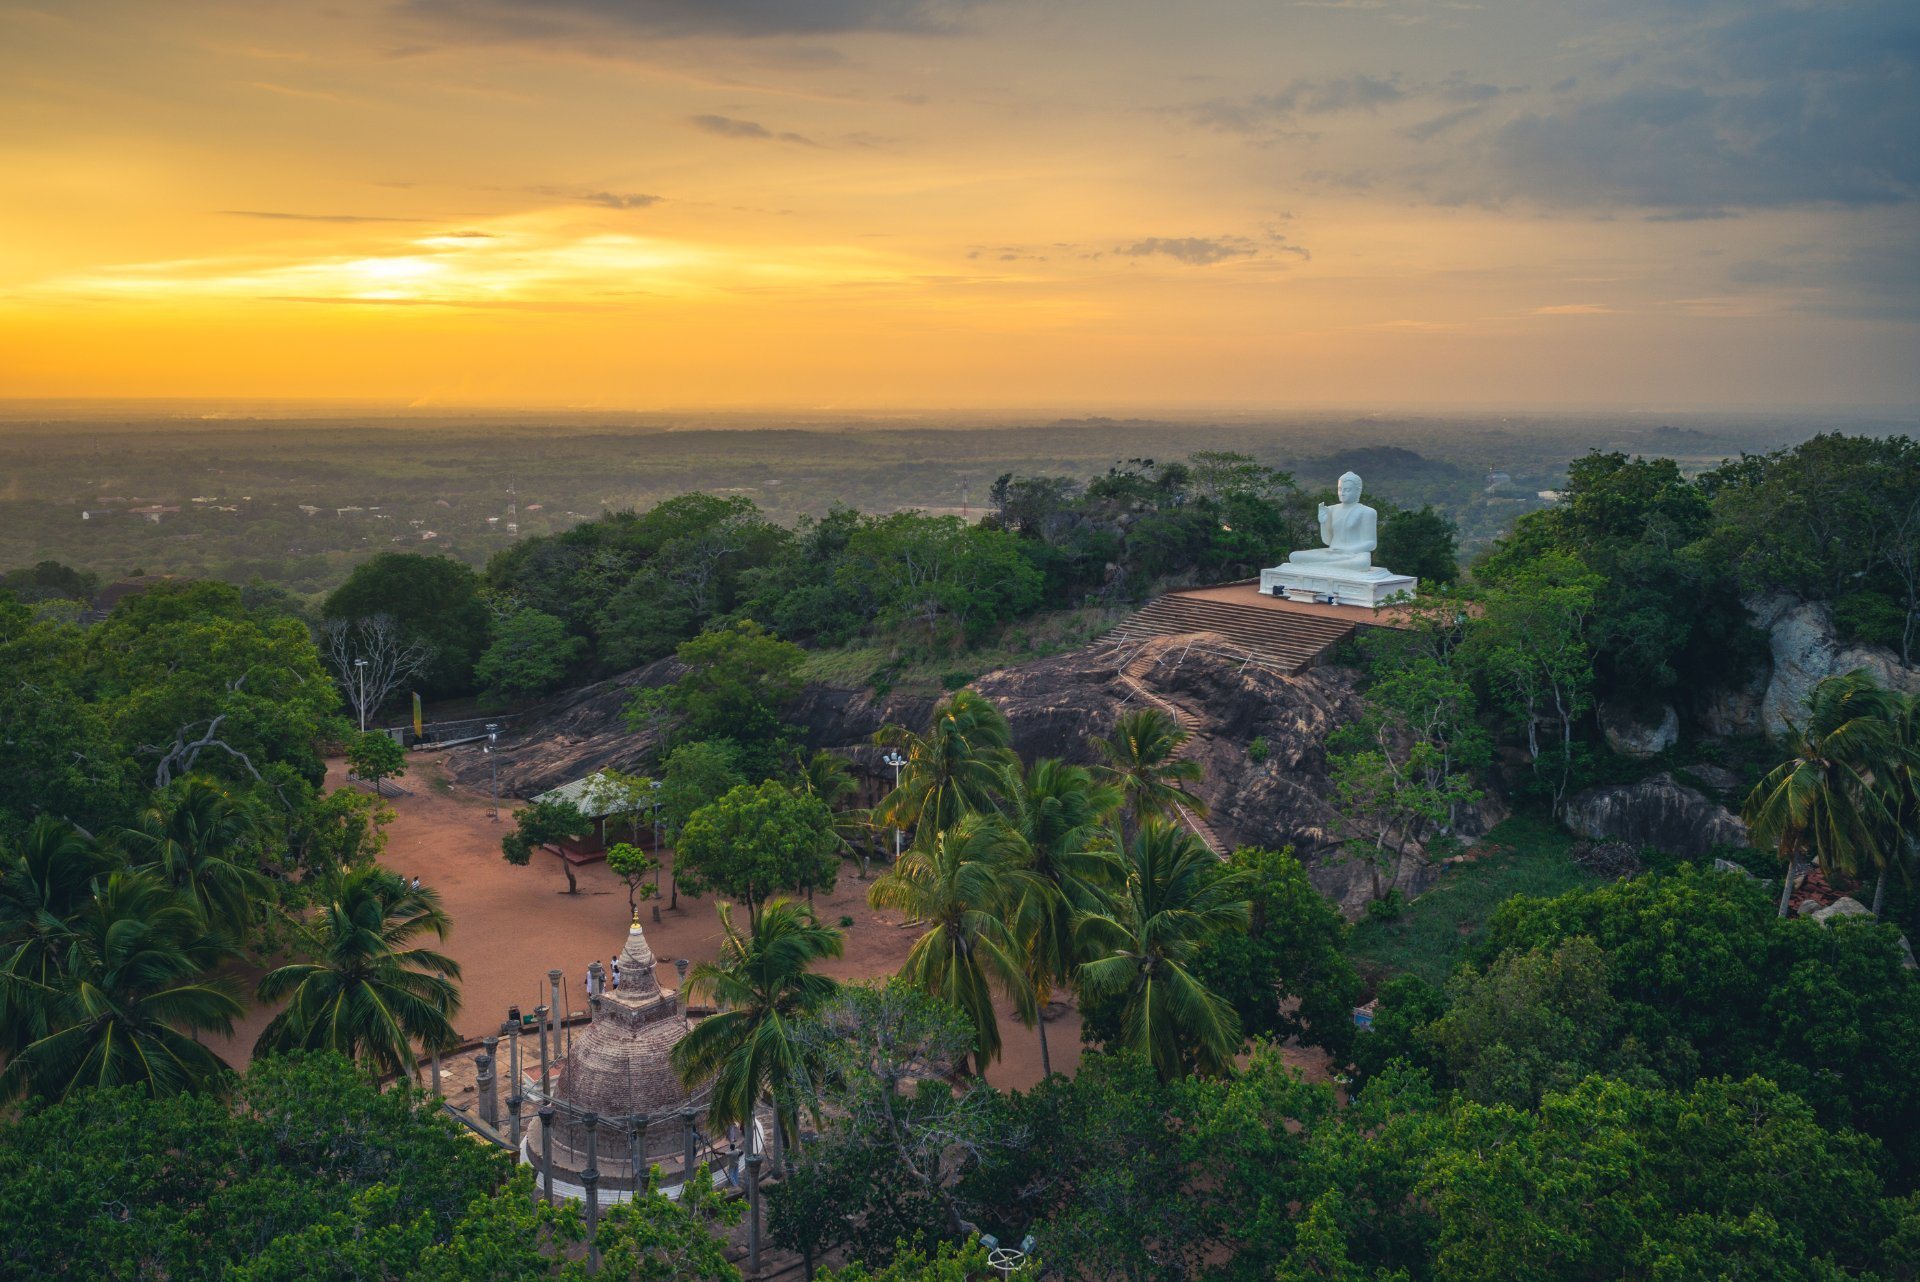 SRI LANKA FASCINANTE (Circuito en hoteles aprobados según protocolo Covid)